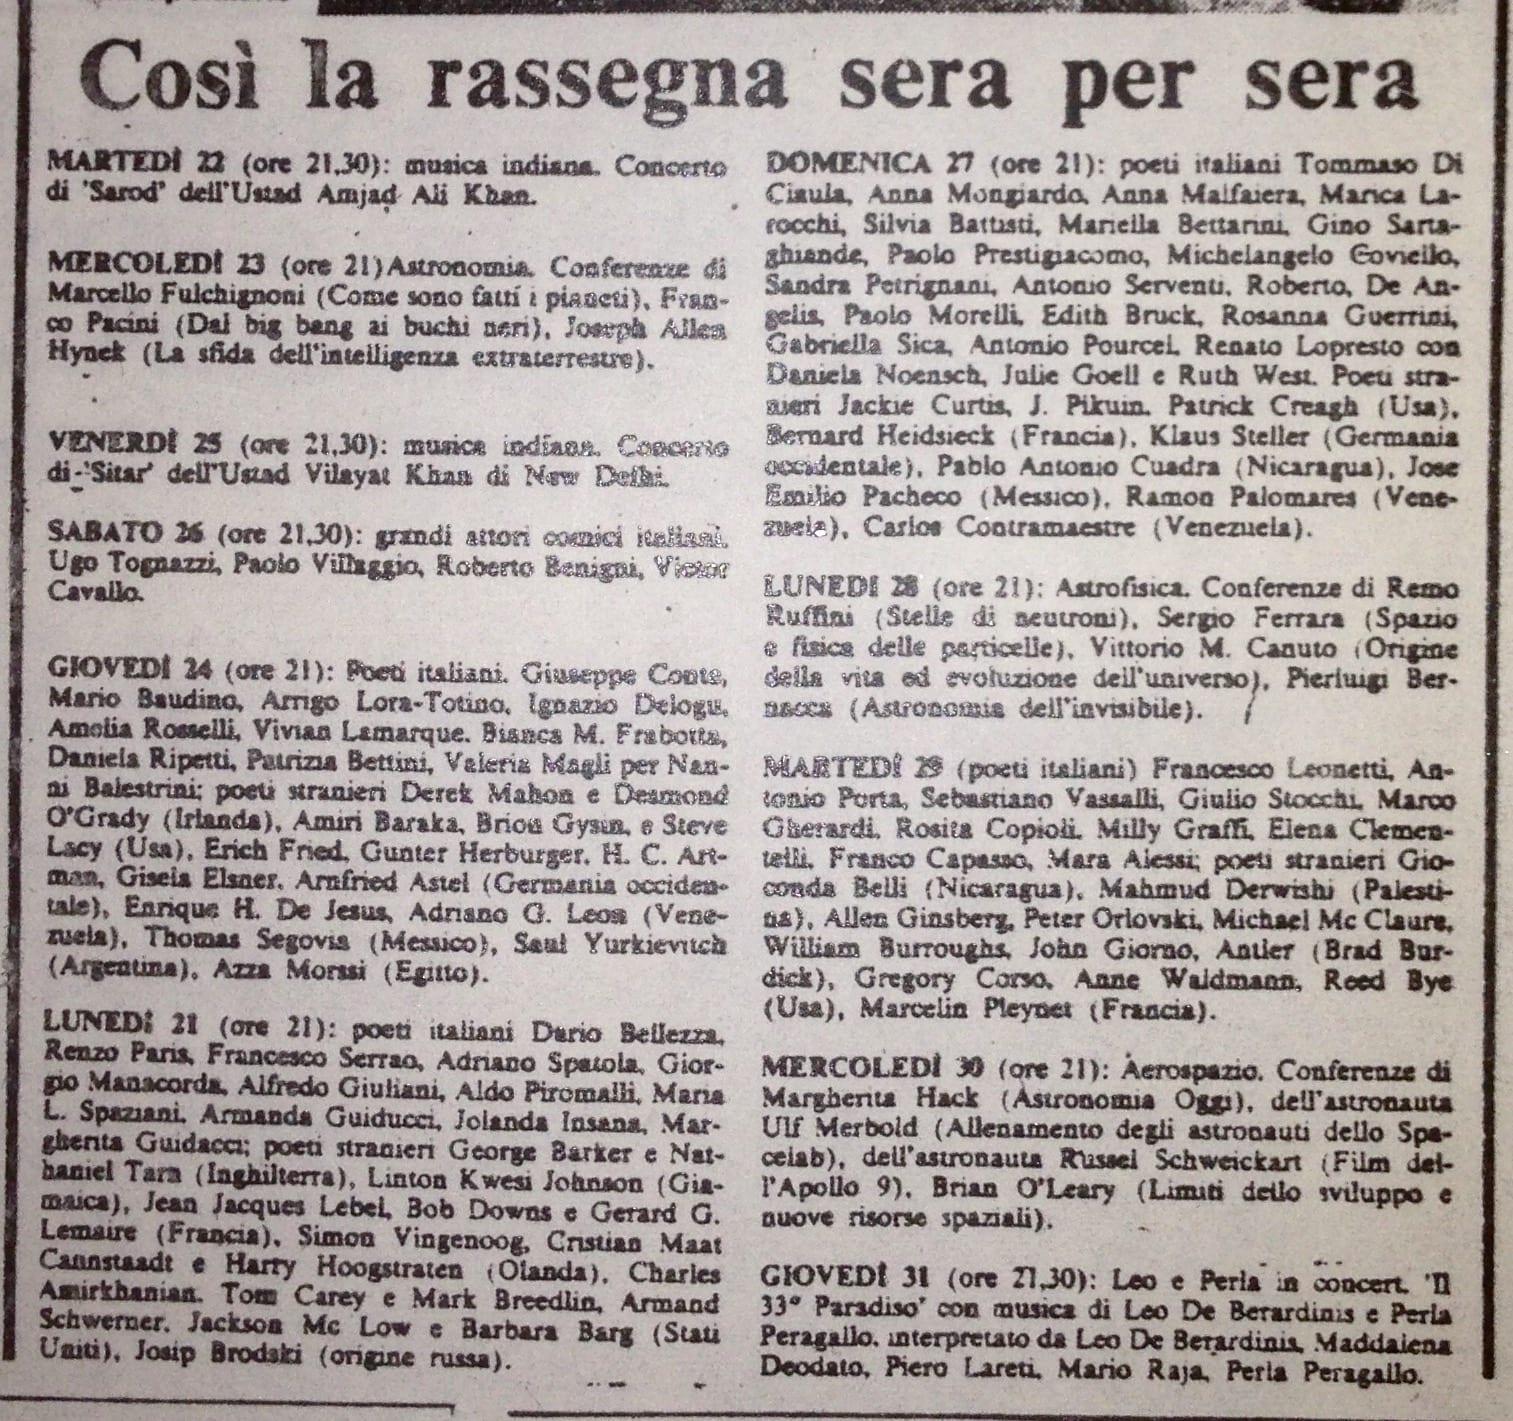 Festival dei Poeti_Piazza Siena_1980_elenco partecipanti-min